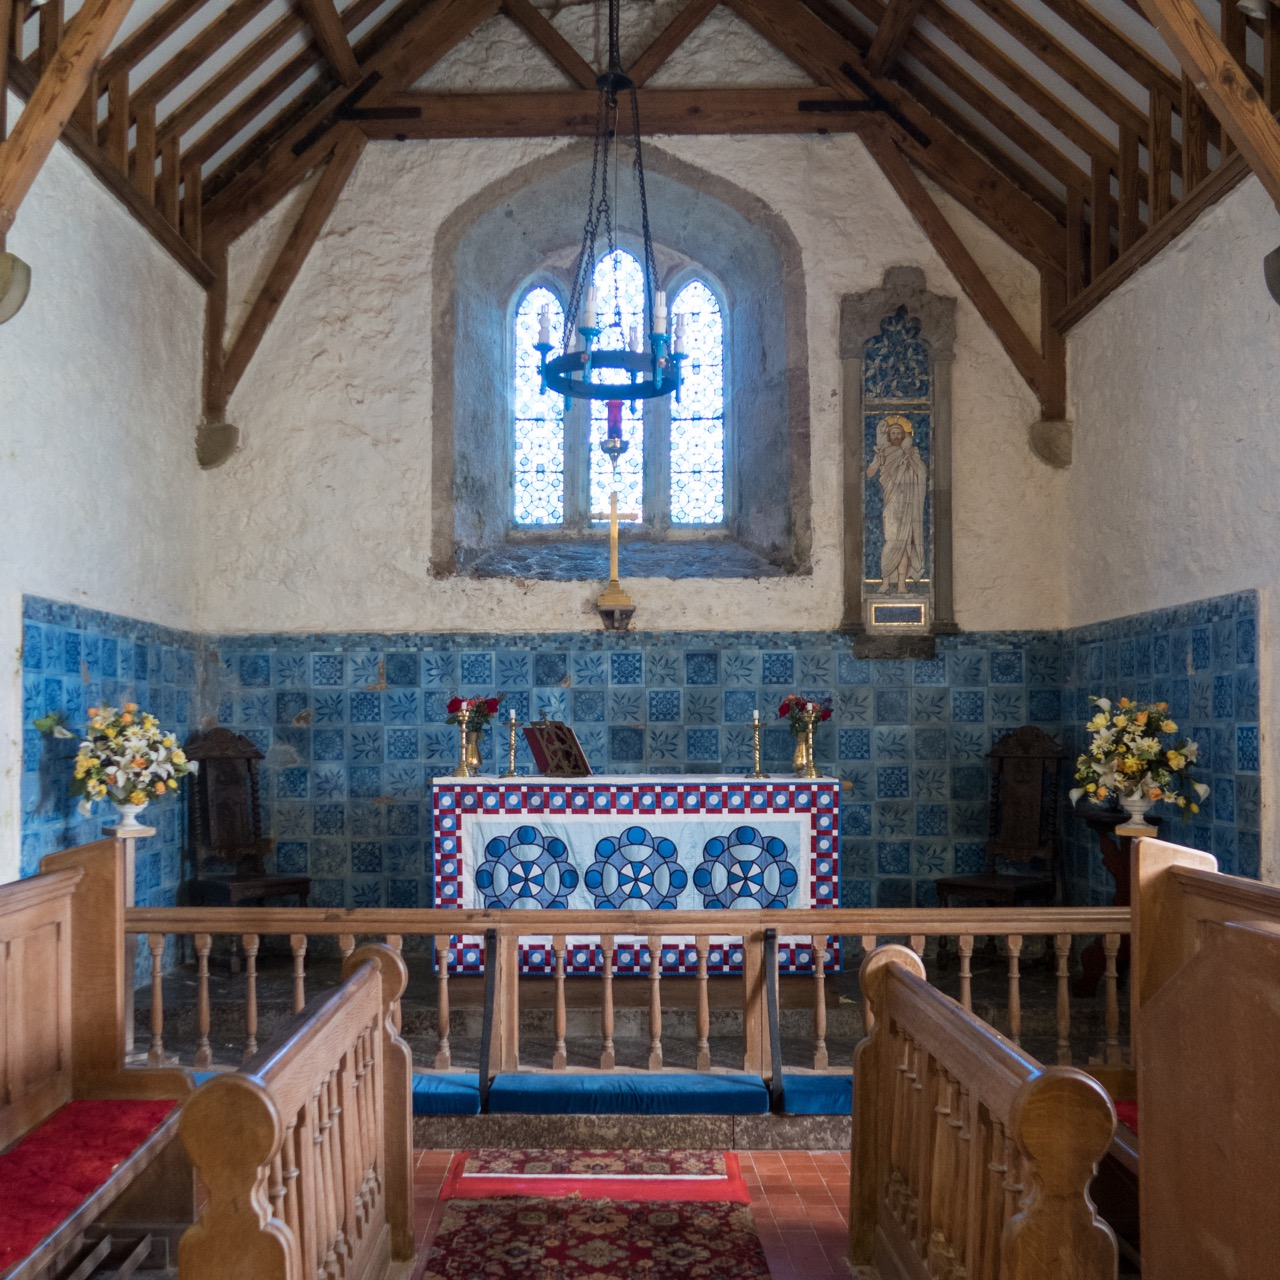 Eglwys Sant Padrig/St Patrick's Church, Innenansicht